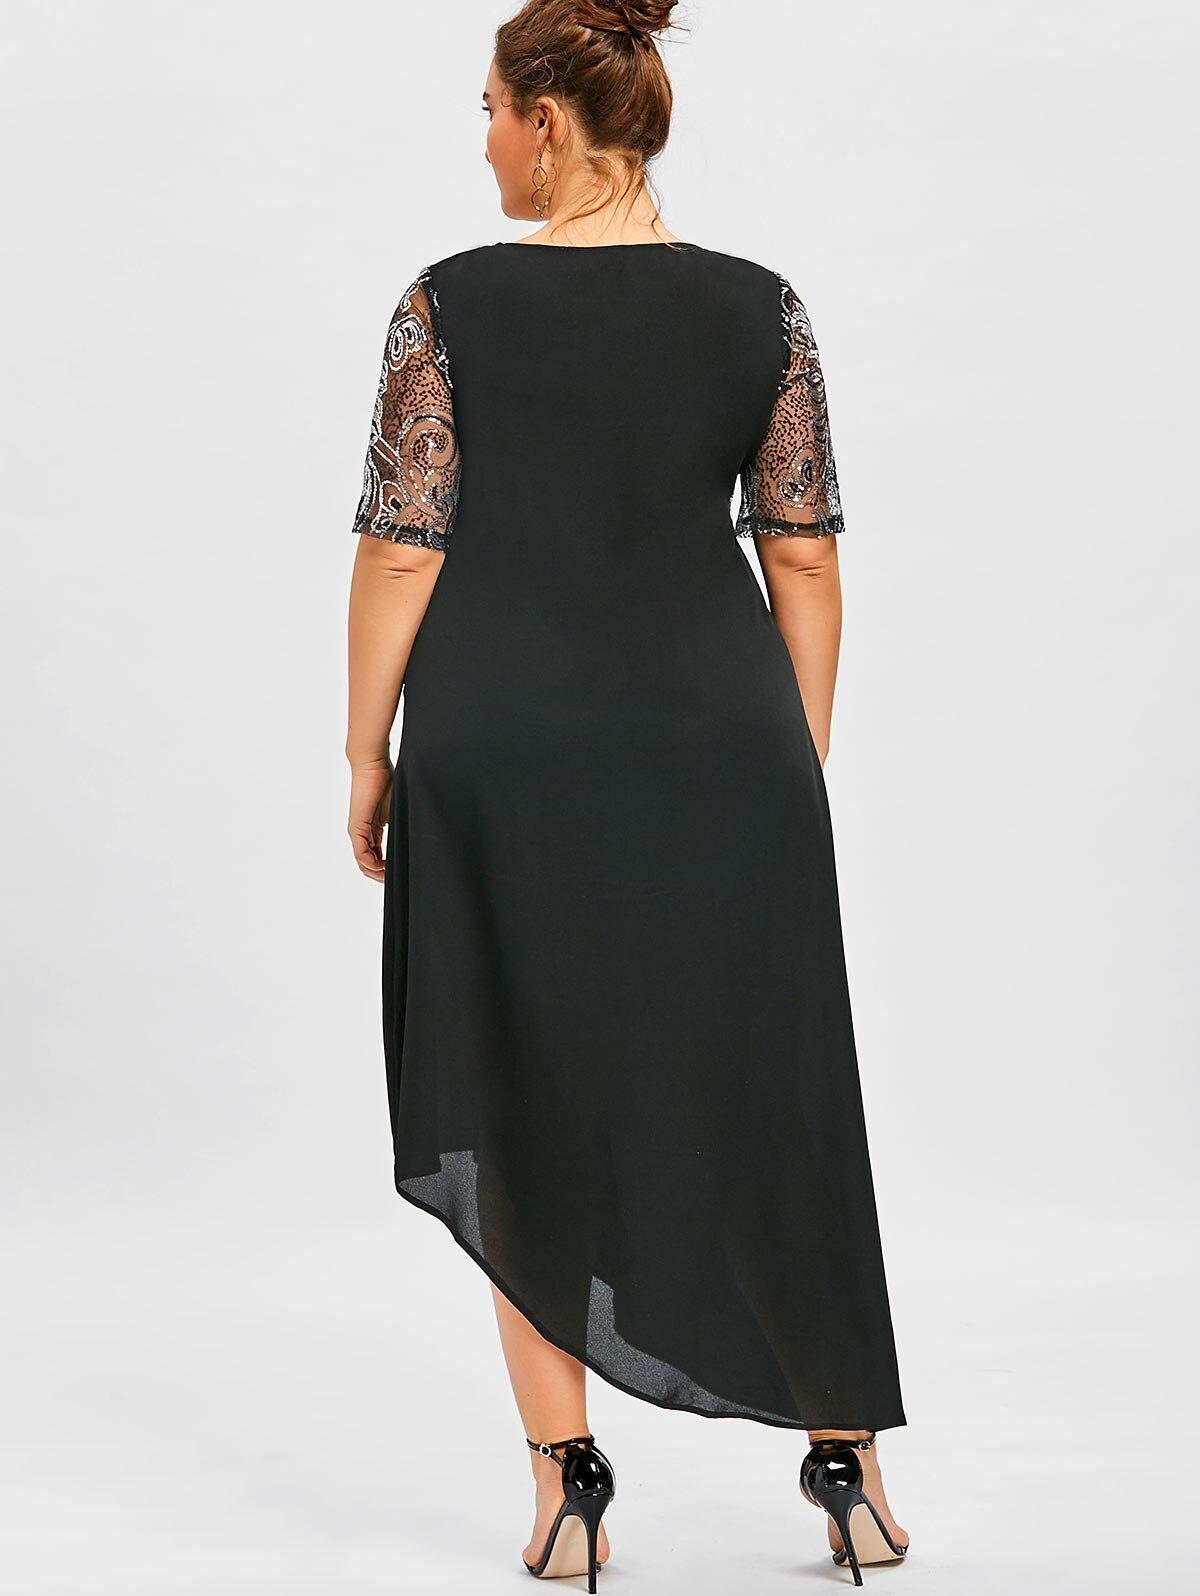 45d5d46ea50d Gamiss Women Sparkly Party Dresses 5XL Plus Size Sequined Asymmetric Maxi  Dress Summer Elegant Black Half Sleeves Dress Vestidos-in Dresses from  Women's ...